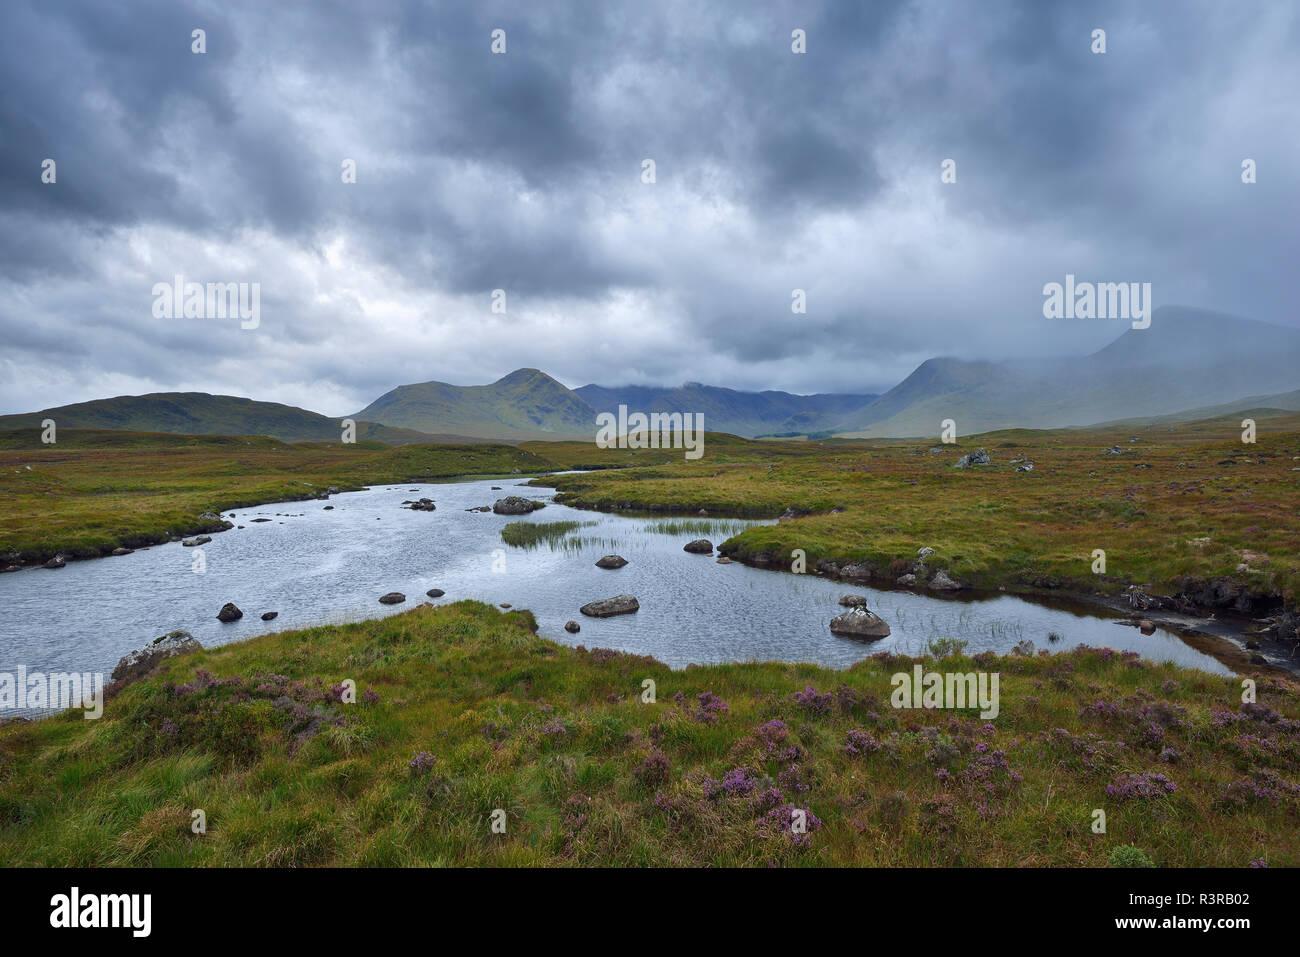 Great Britain, Scotland, Scottish Highlands, Glencoe, Rannoch Moor, Loch Ba and rain clouds - Stock Image